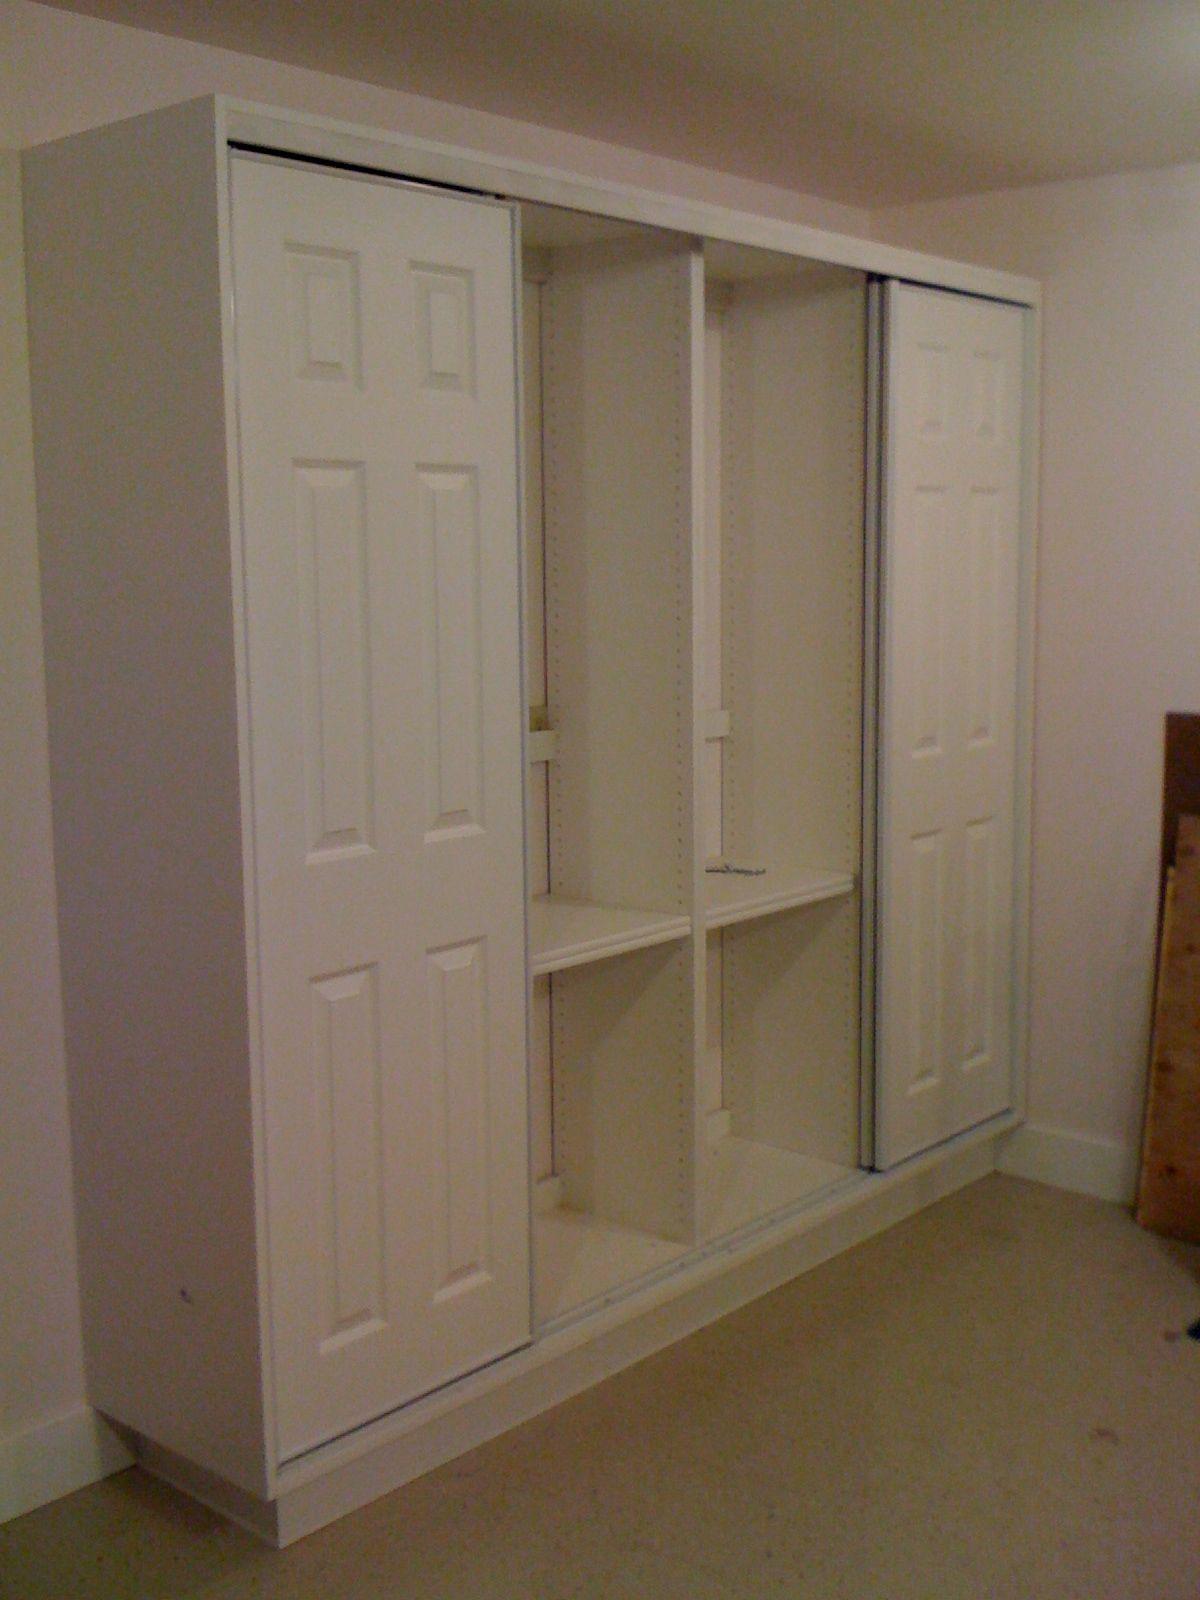 Hallway storage with sliding doors  Garage Storage Cabinet Retro Tech Construction Llc for dimensions